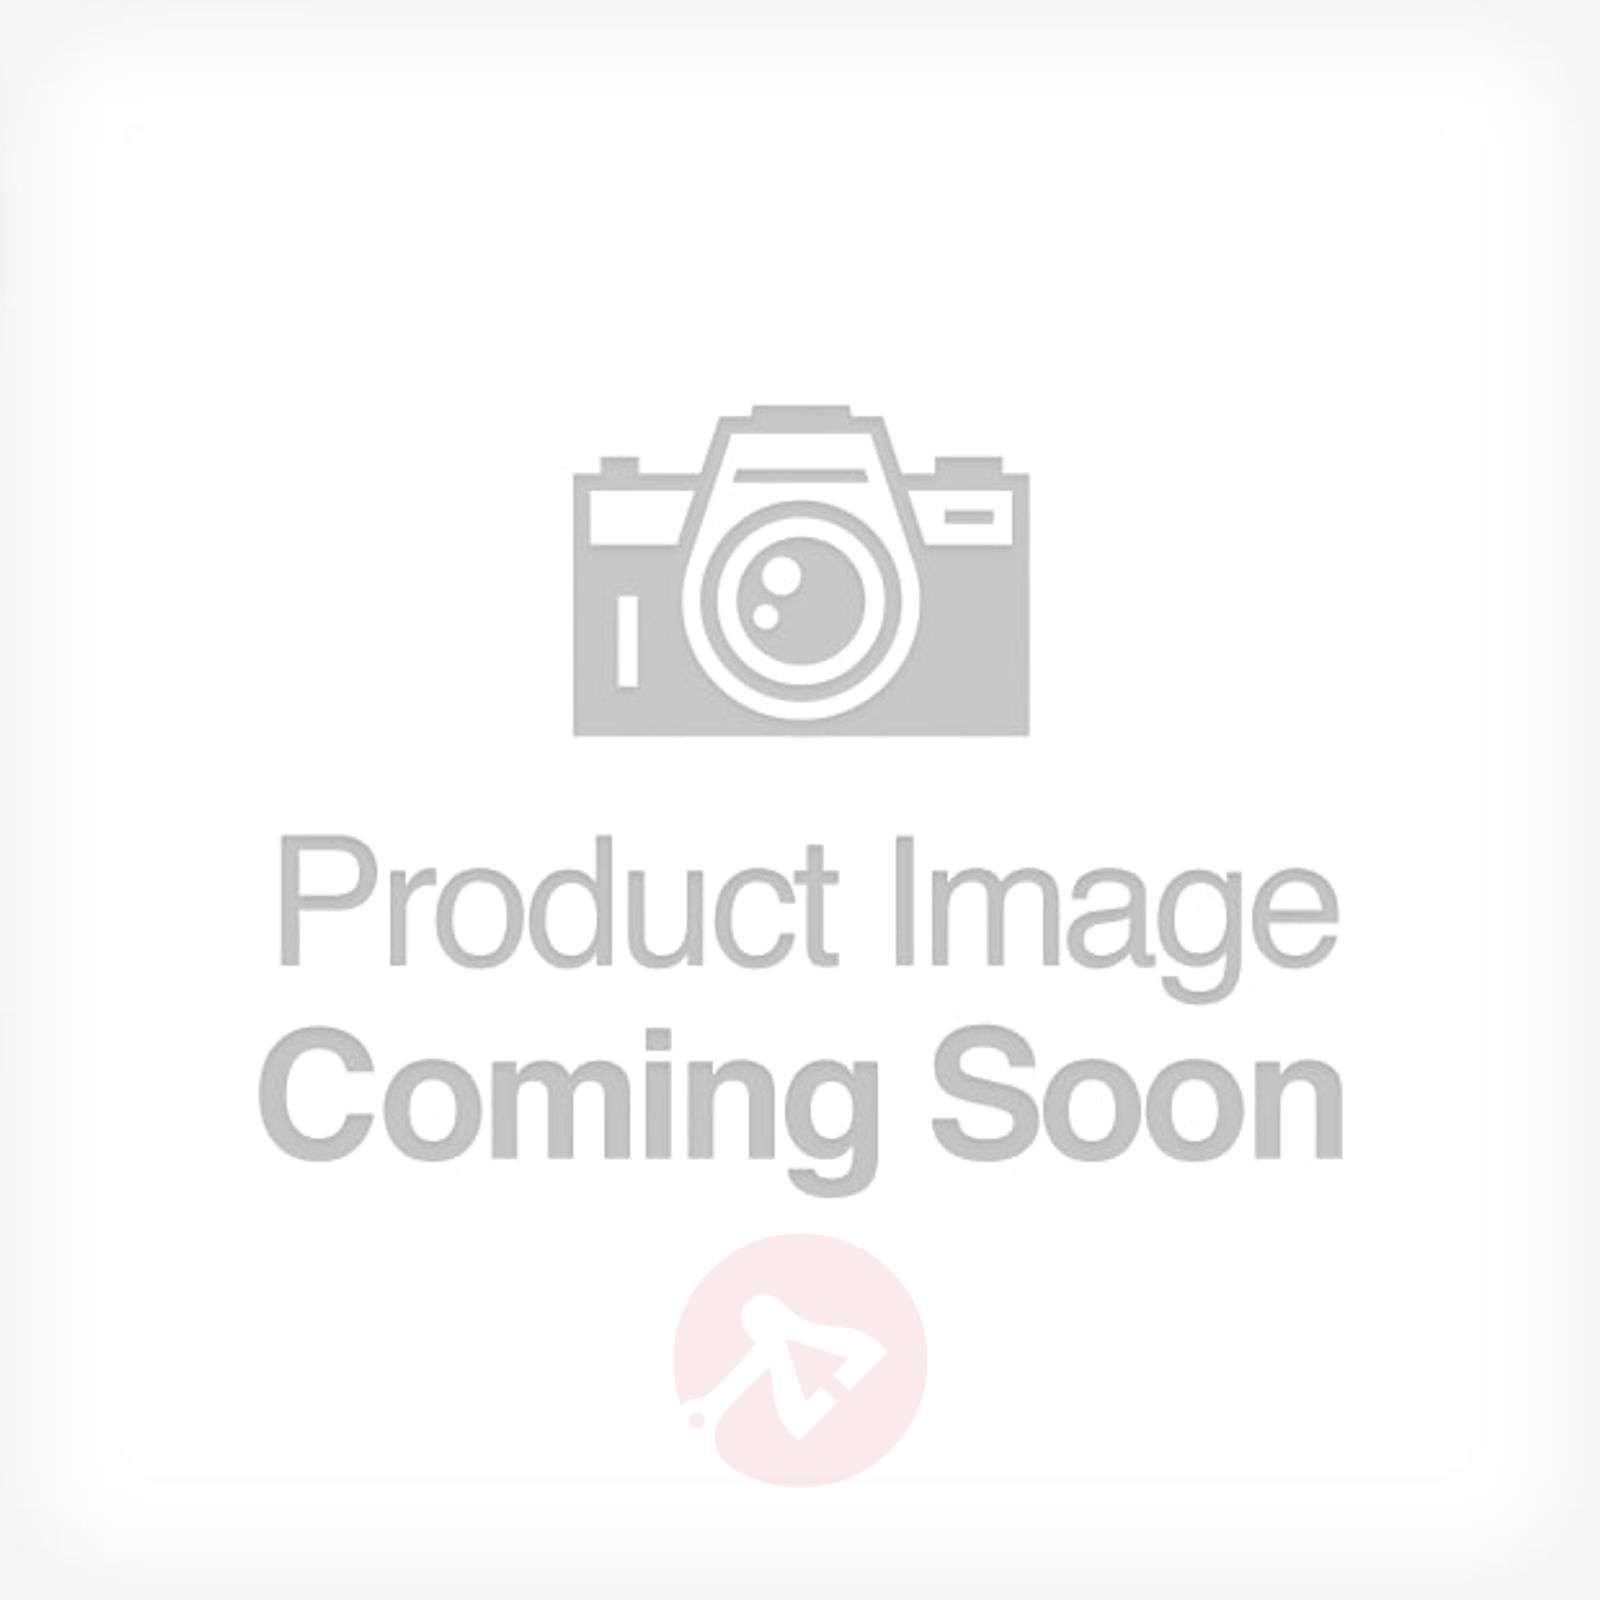 Arezzo mirror adapter kit-1020018-03